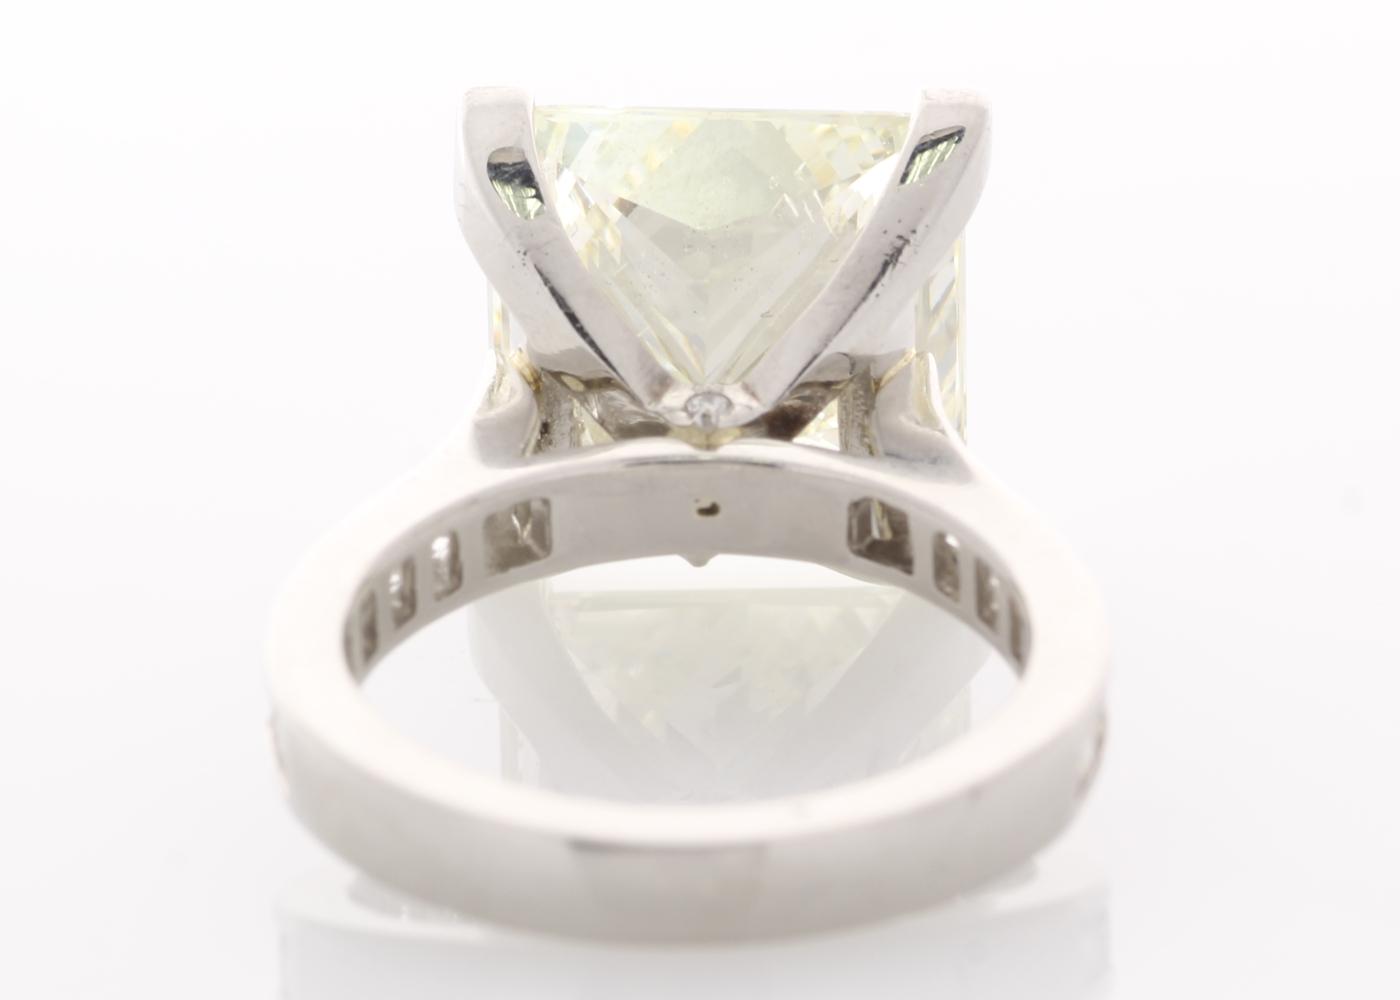 Lot 27 - 18ct White Gold Single Stone Prong Set With Stone Set Shoulders Diamond Ring 10.00 Carats